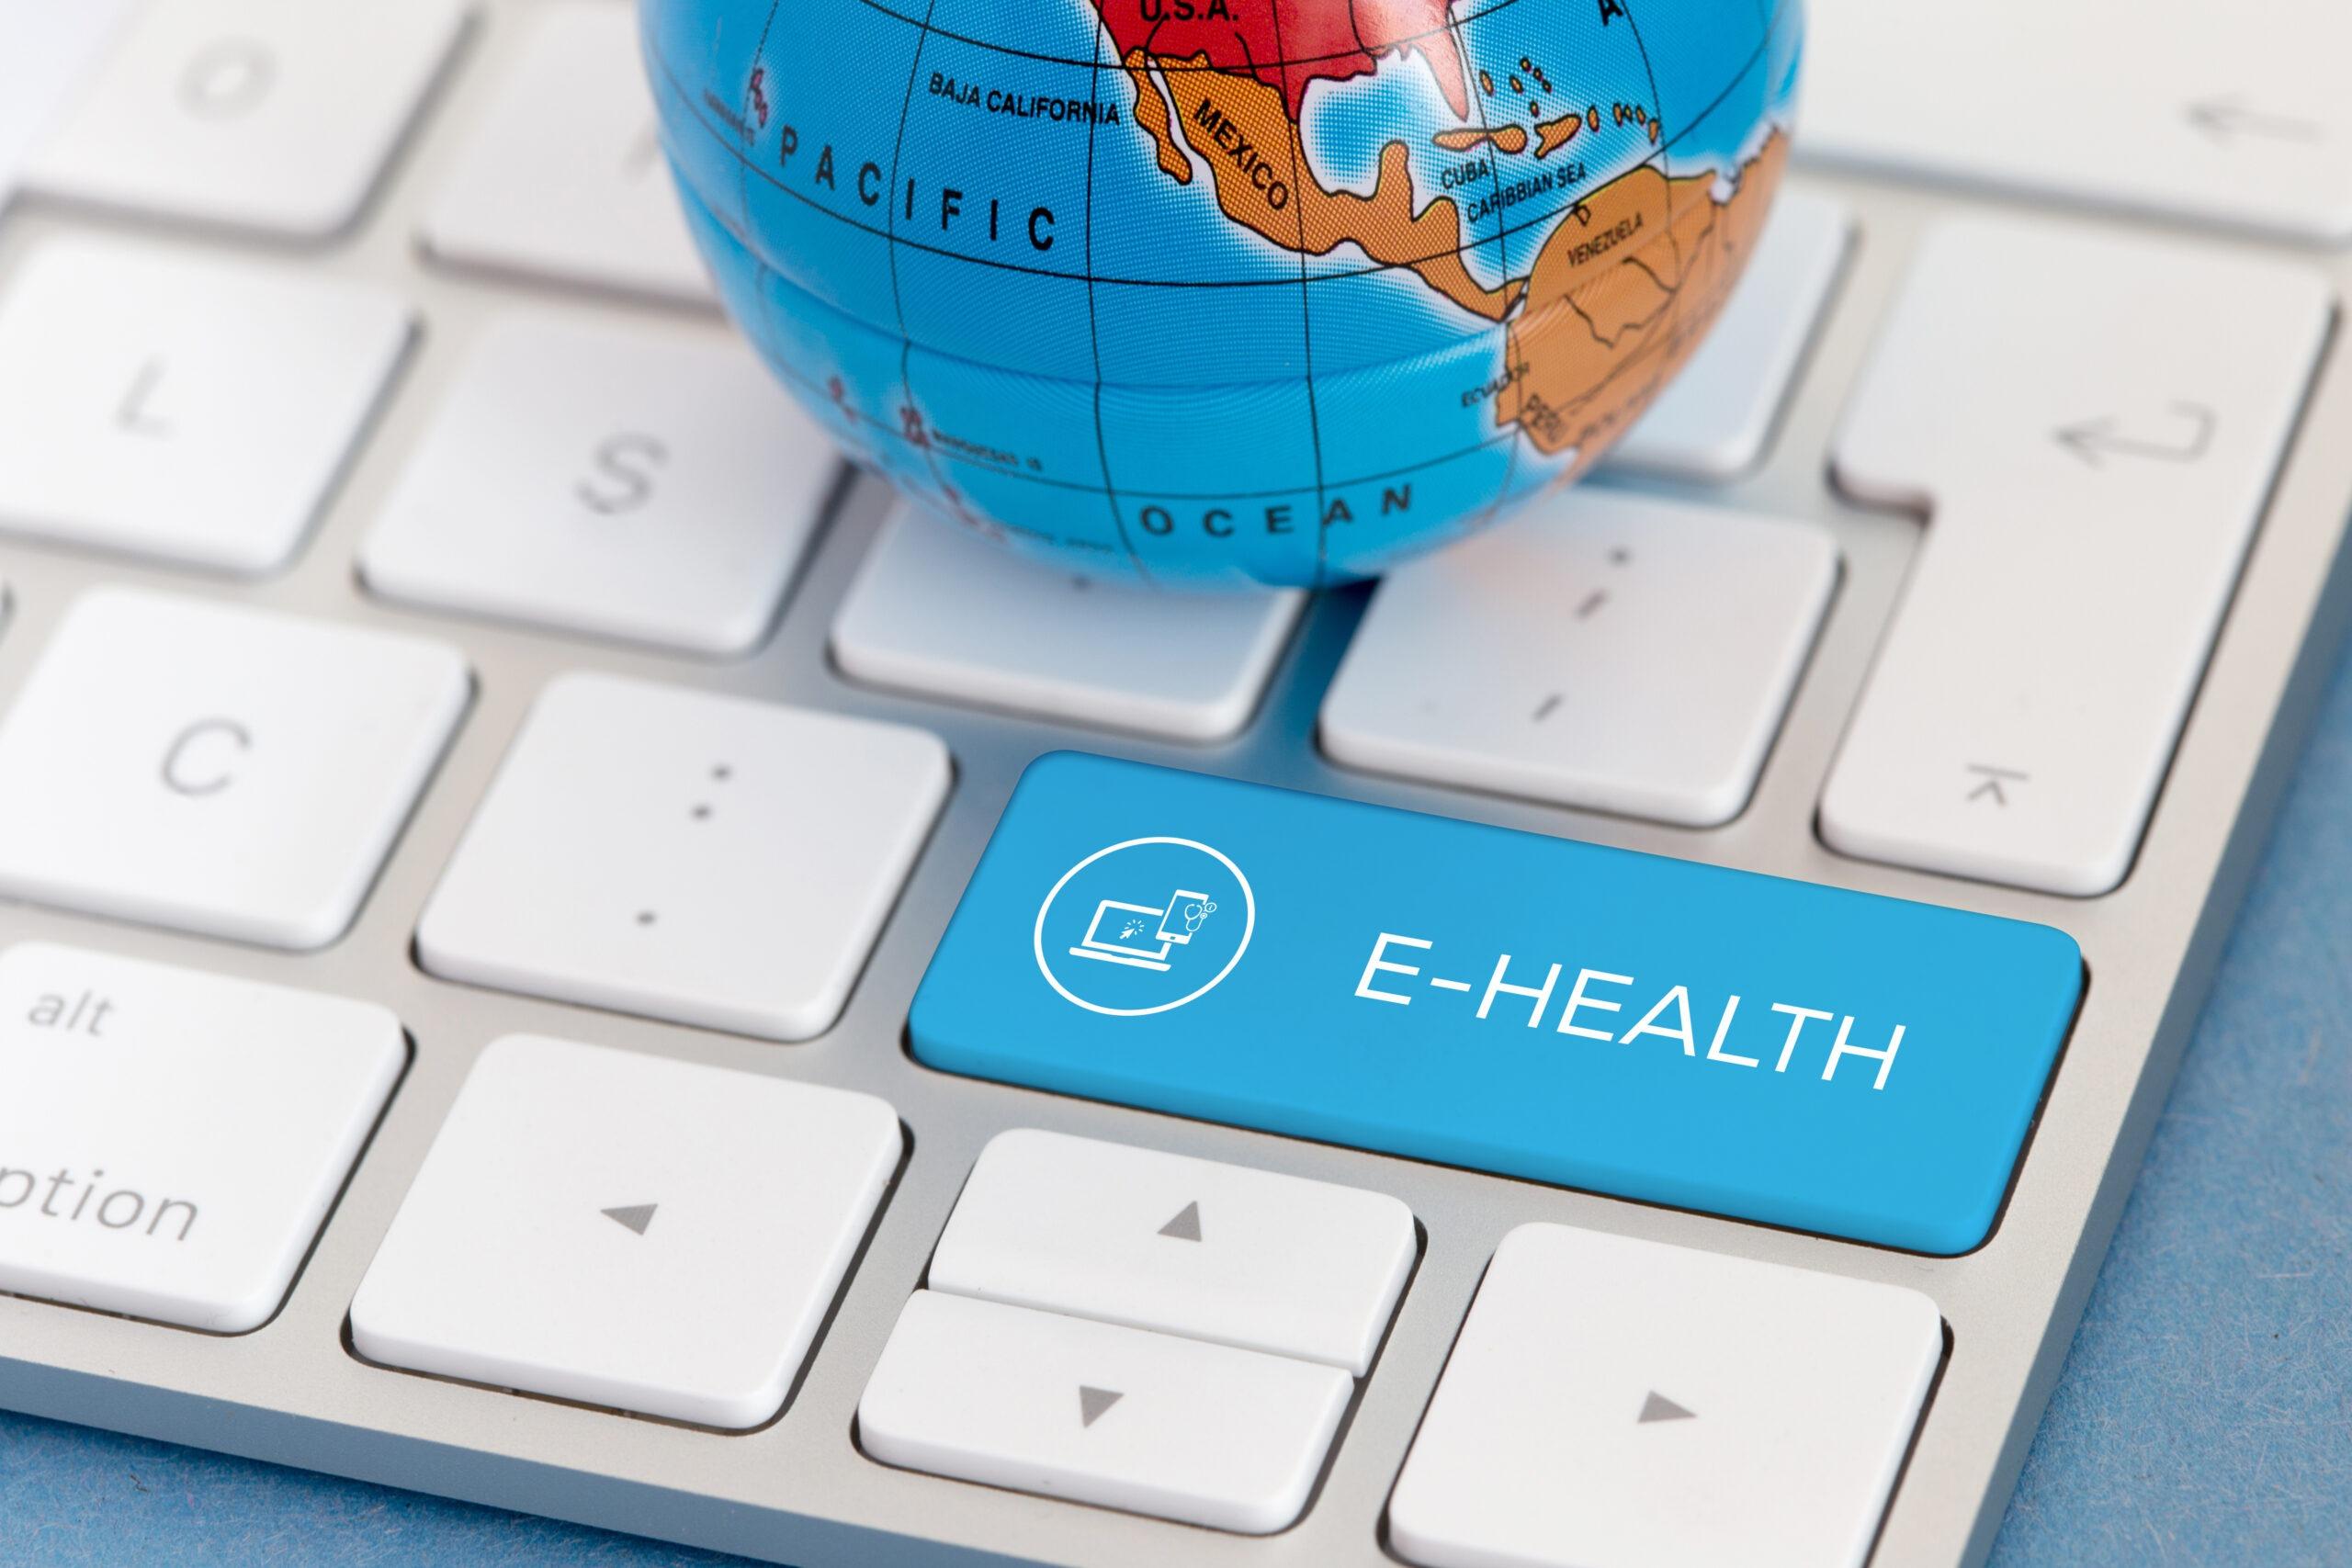 E-HEALTH CONCEPT